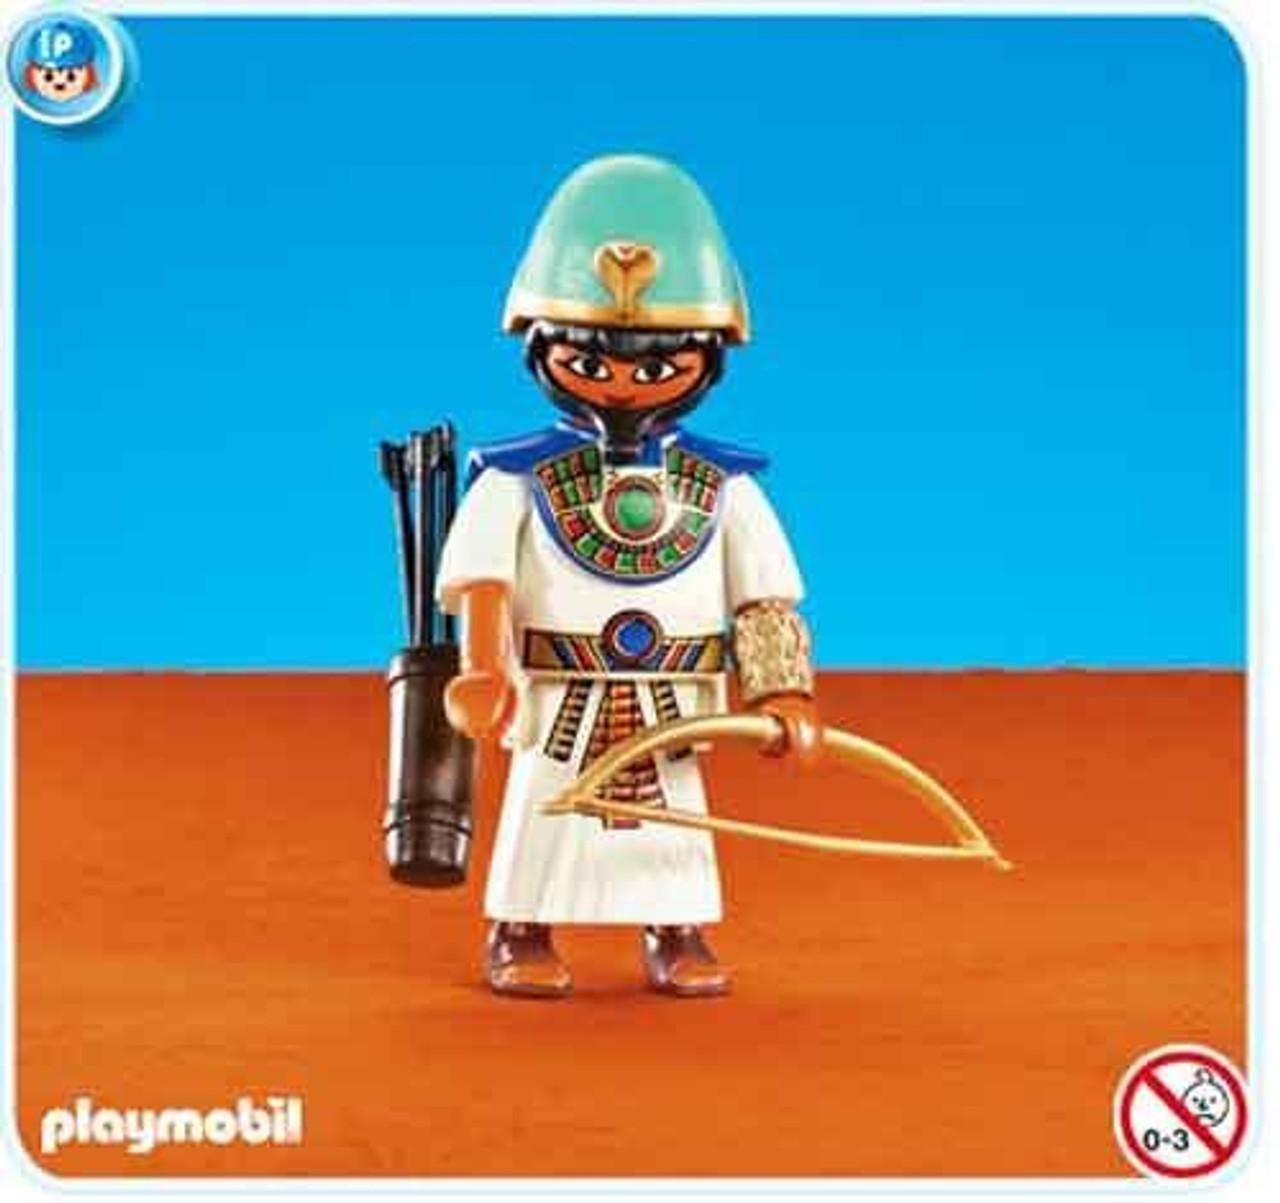 Playmobil Romans & Egyptians Pharaoh Set #7382